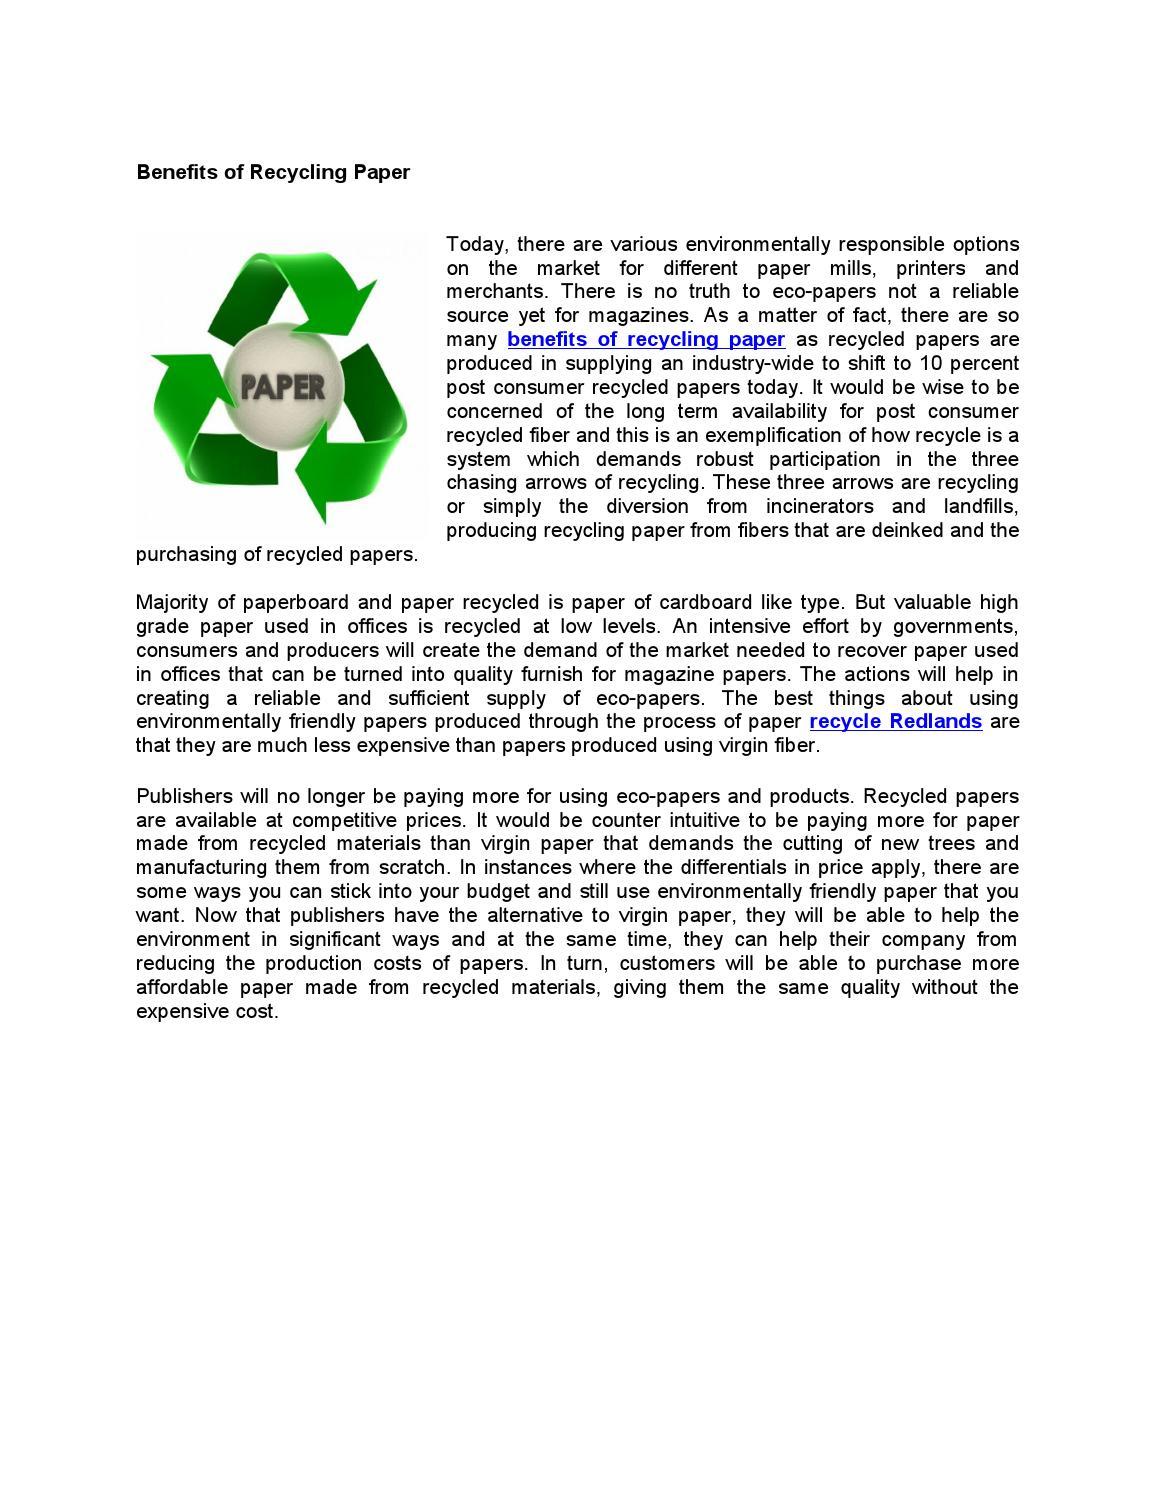 President's Environmental Youth Award